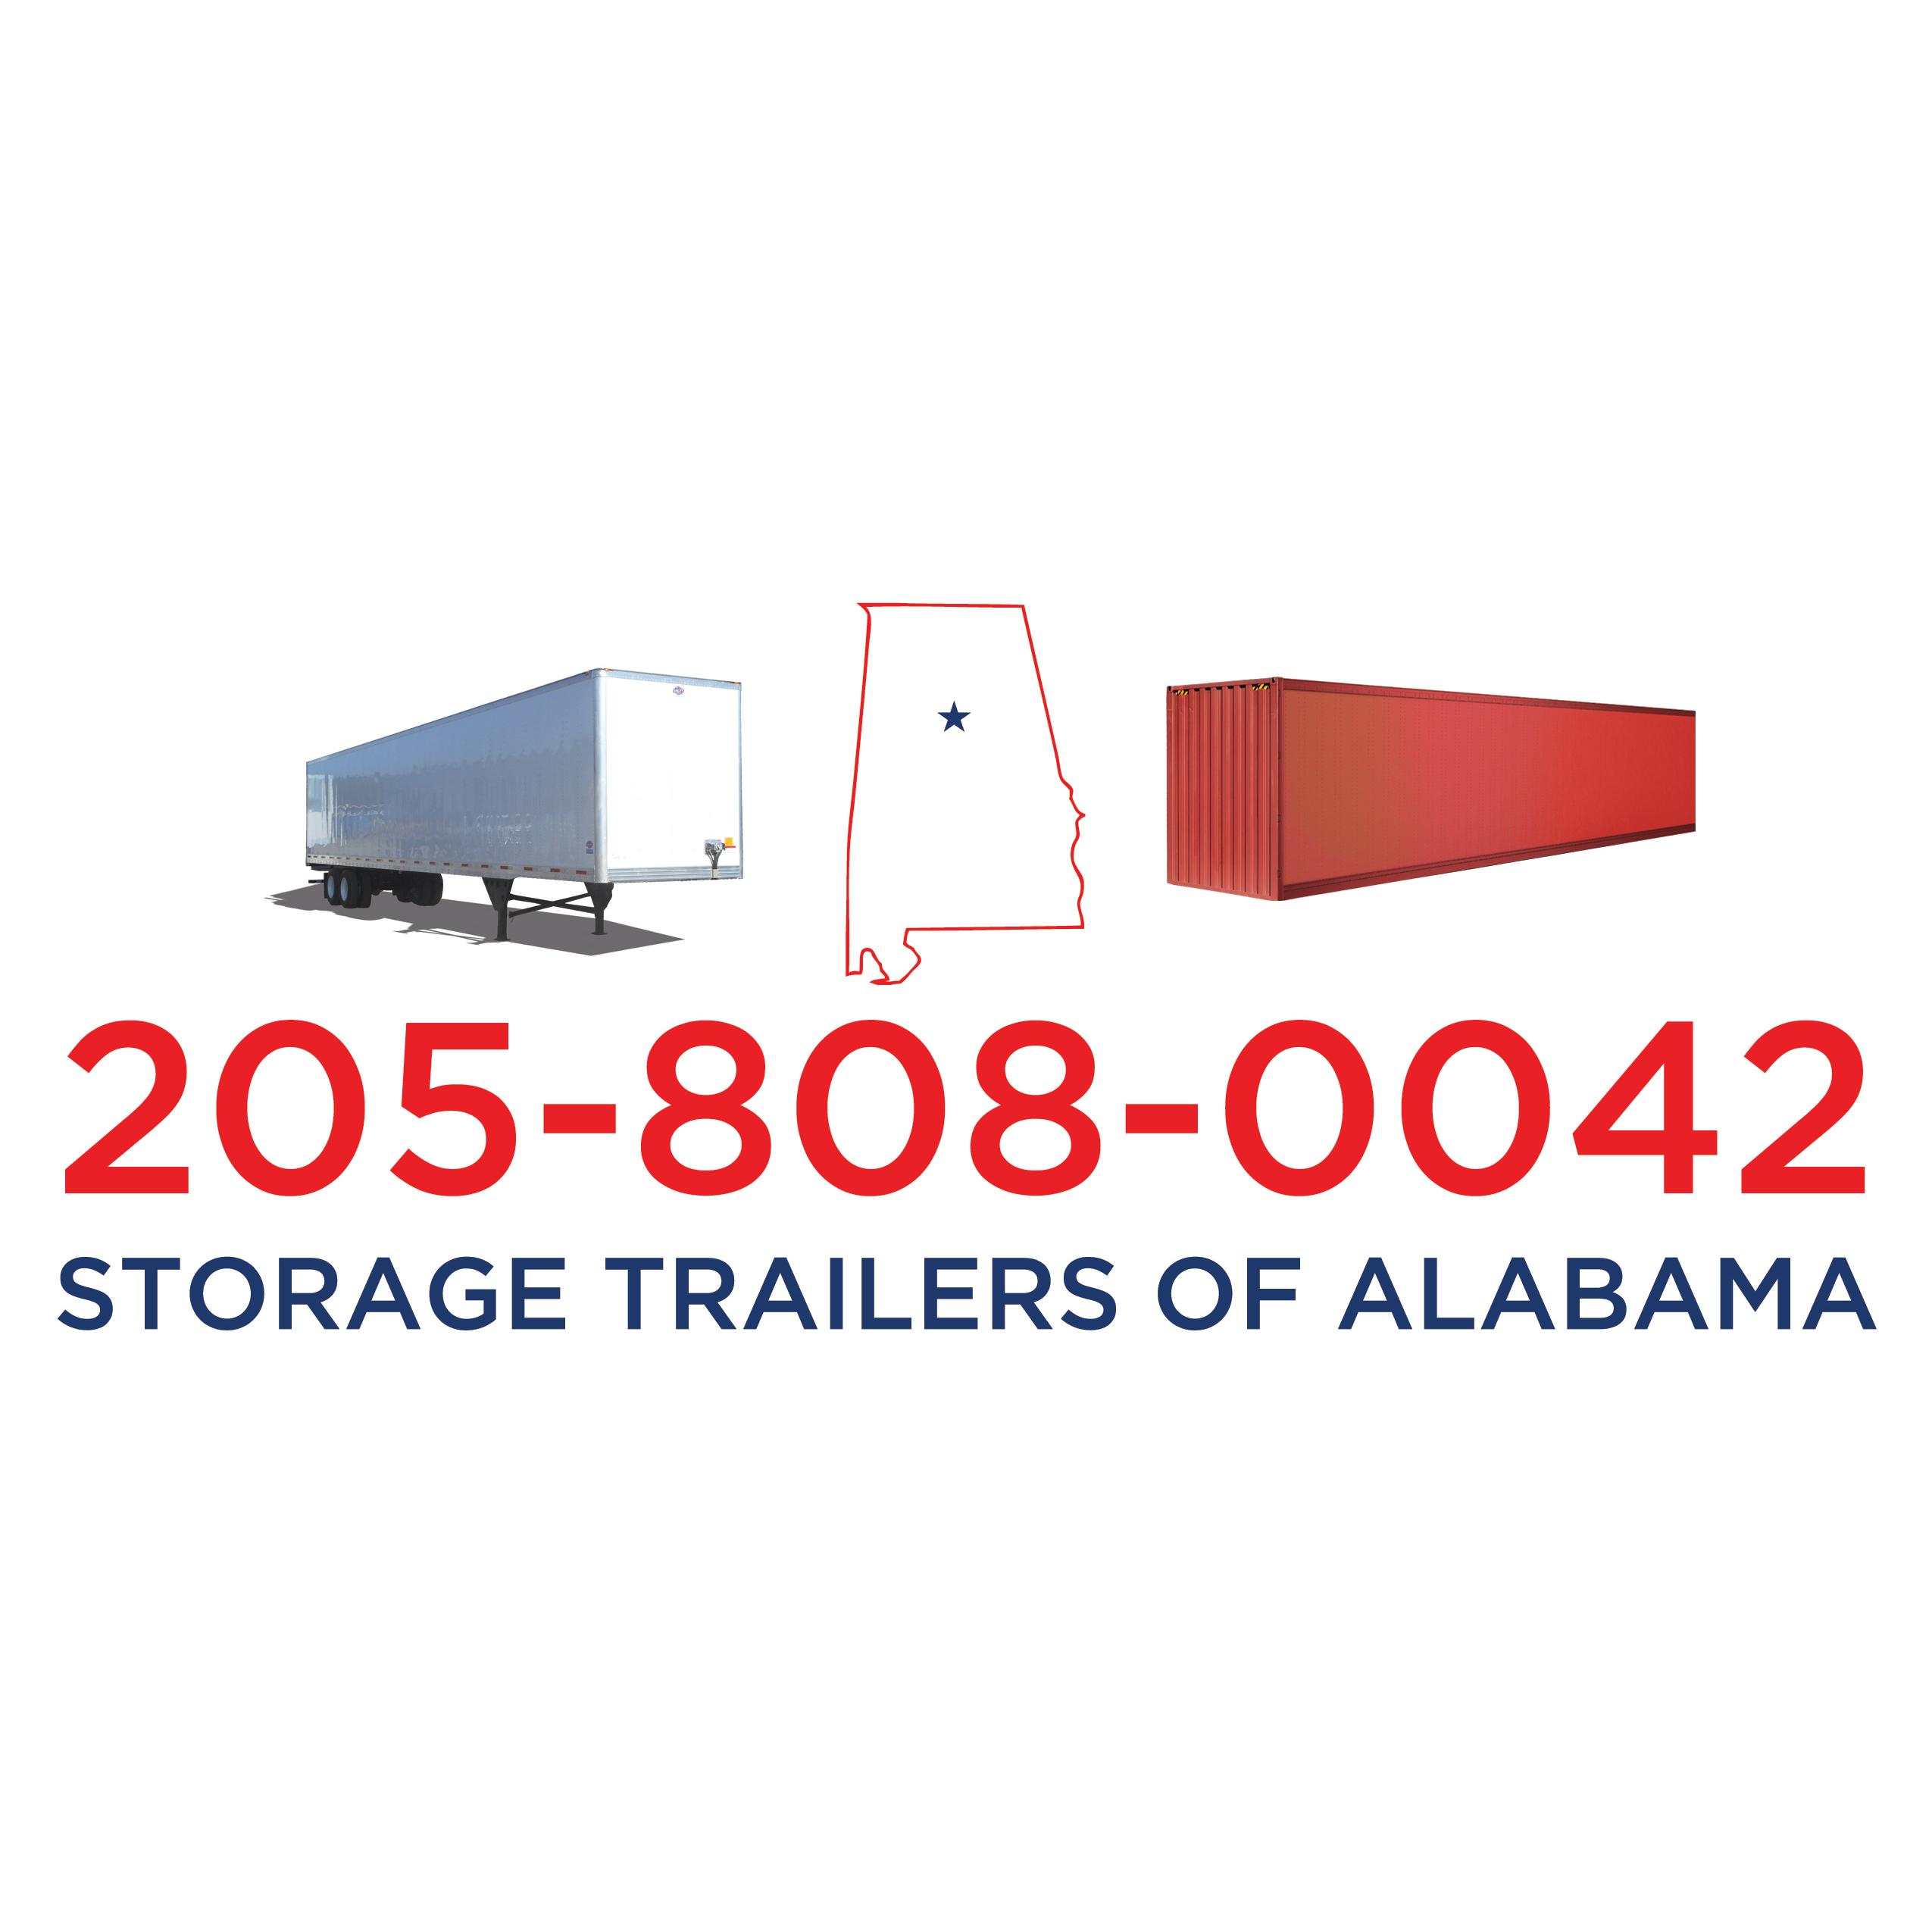 Storage Trailers of Alabama